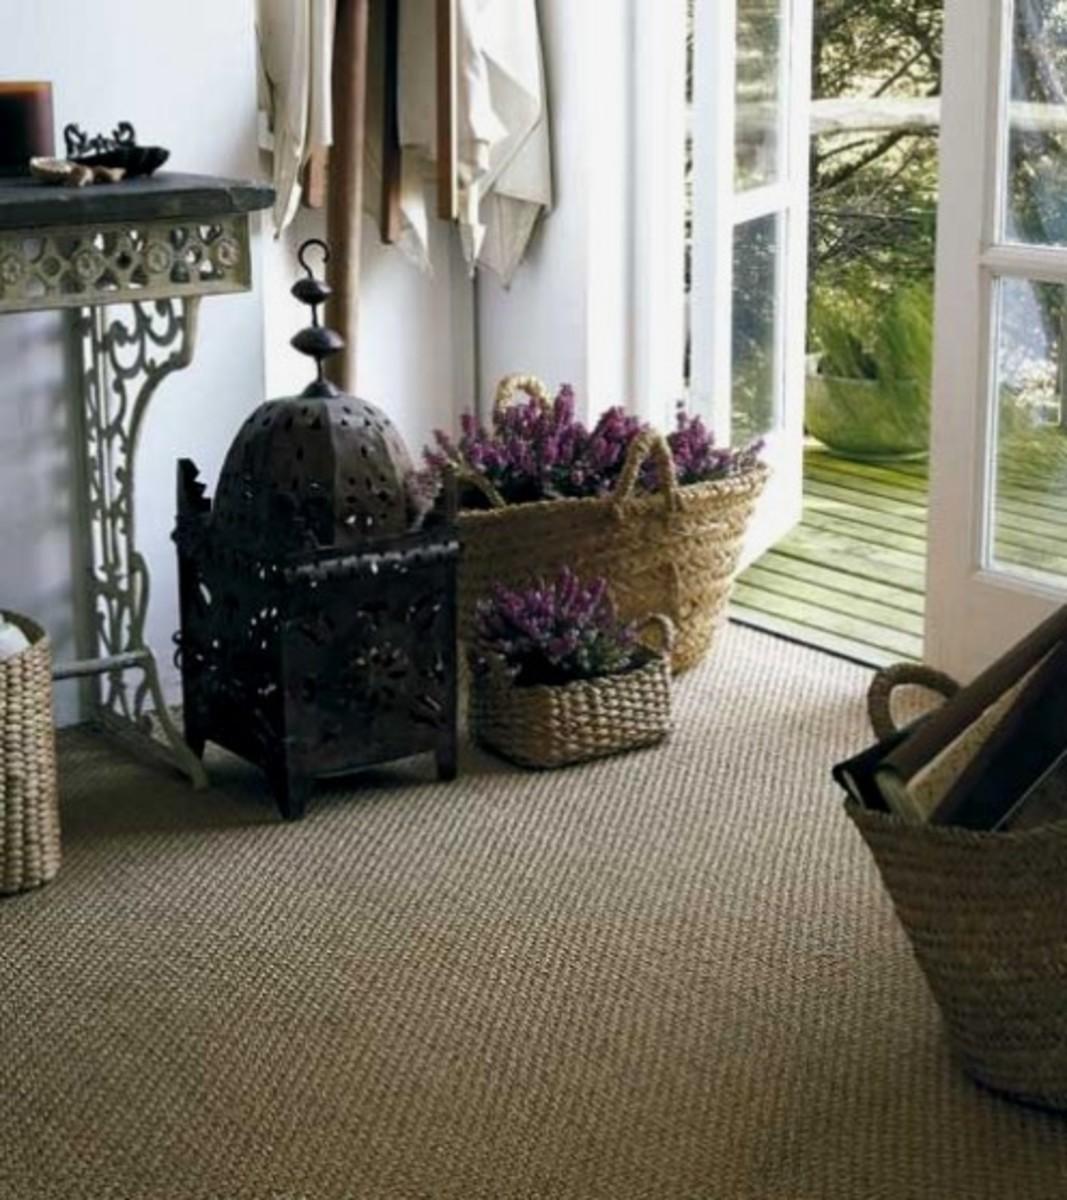 Jute Rug On Laminate Floor: Cheap Flooring Solutions: Seagrass, Painted Floorboards